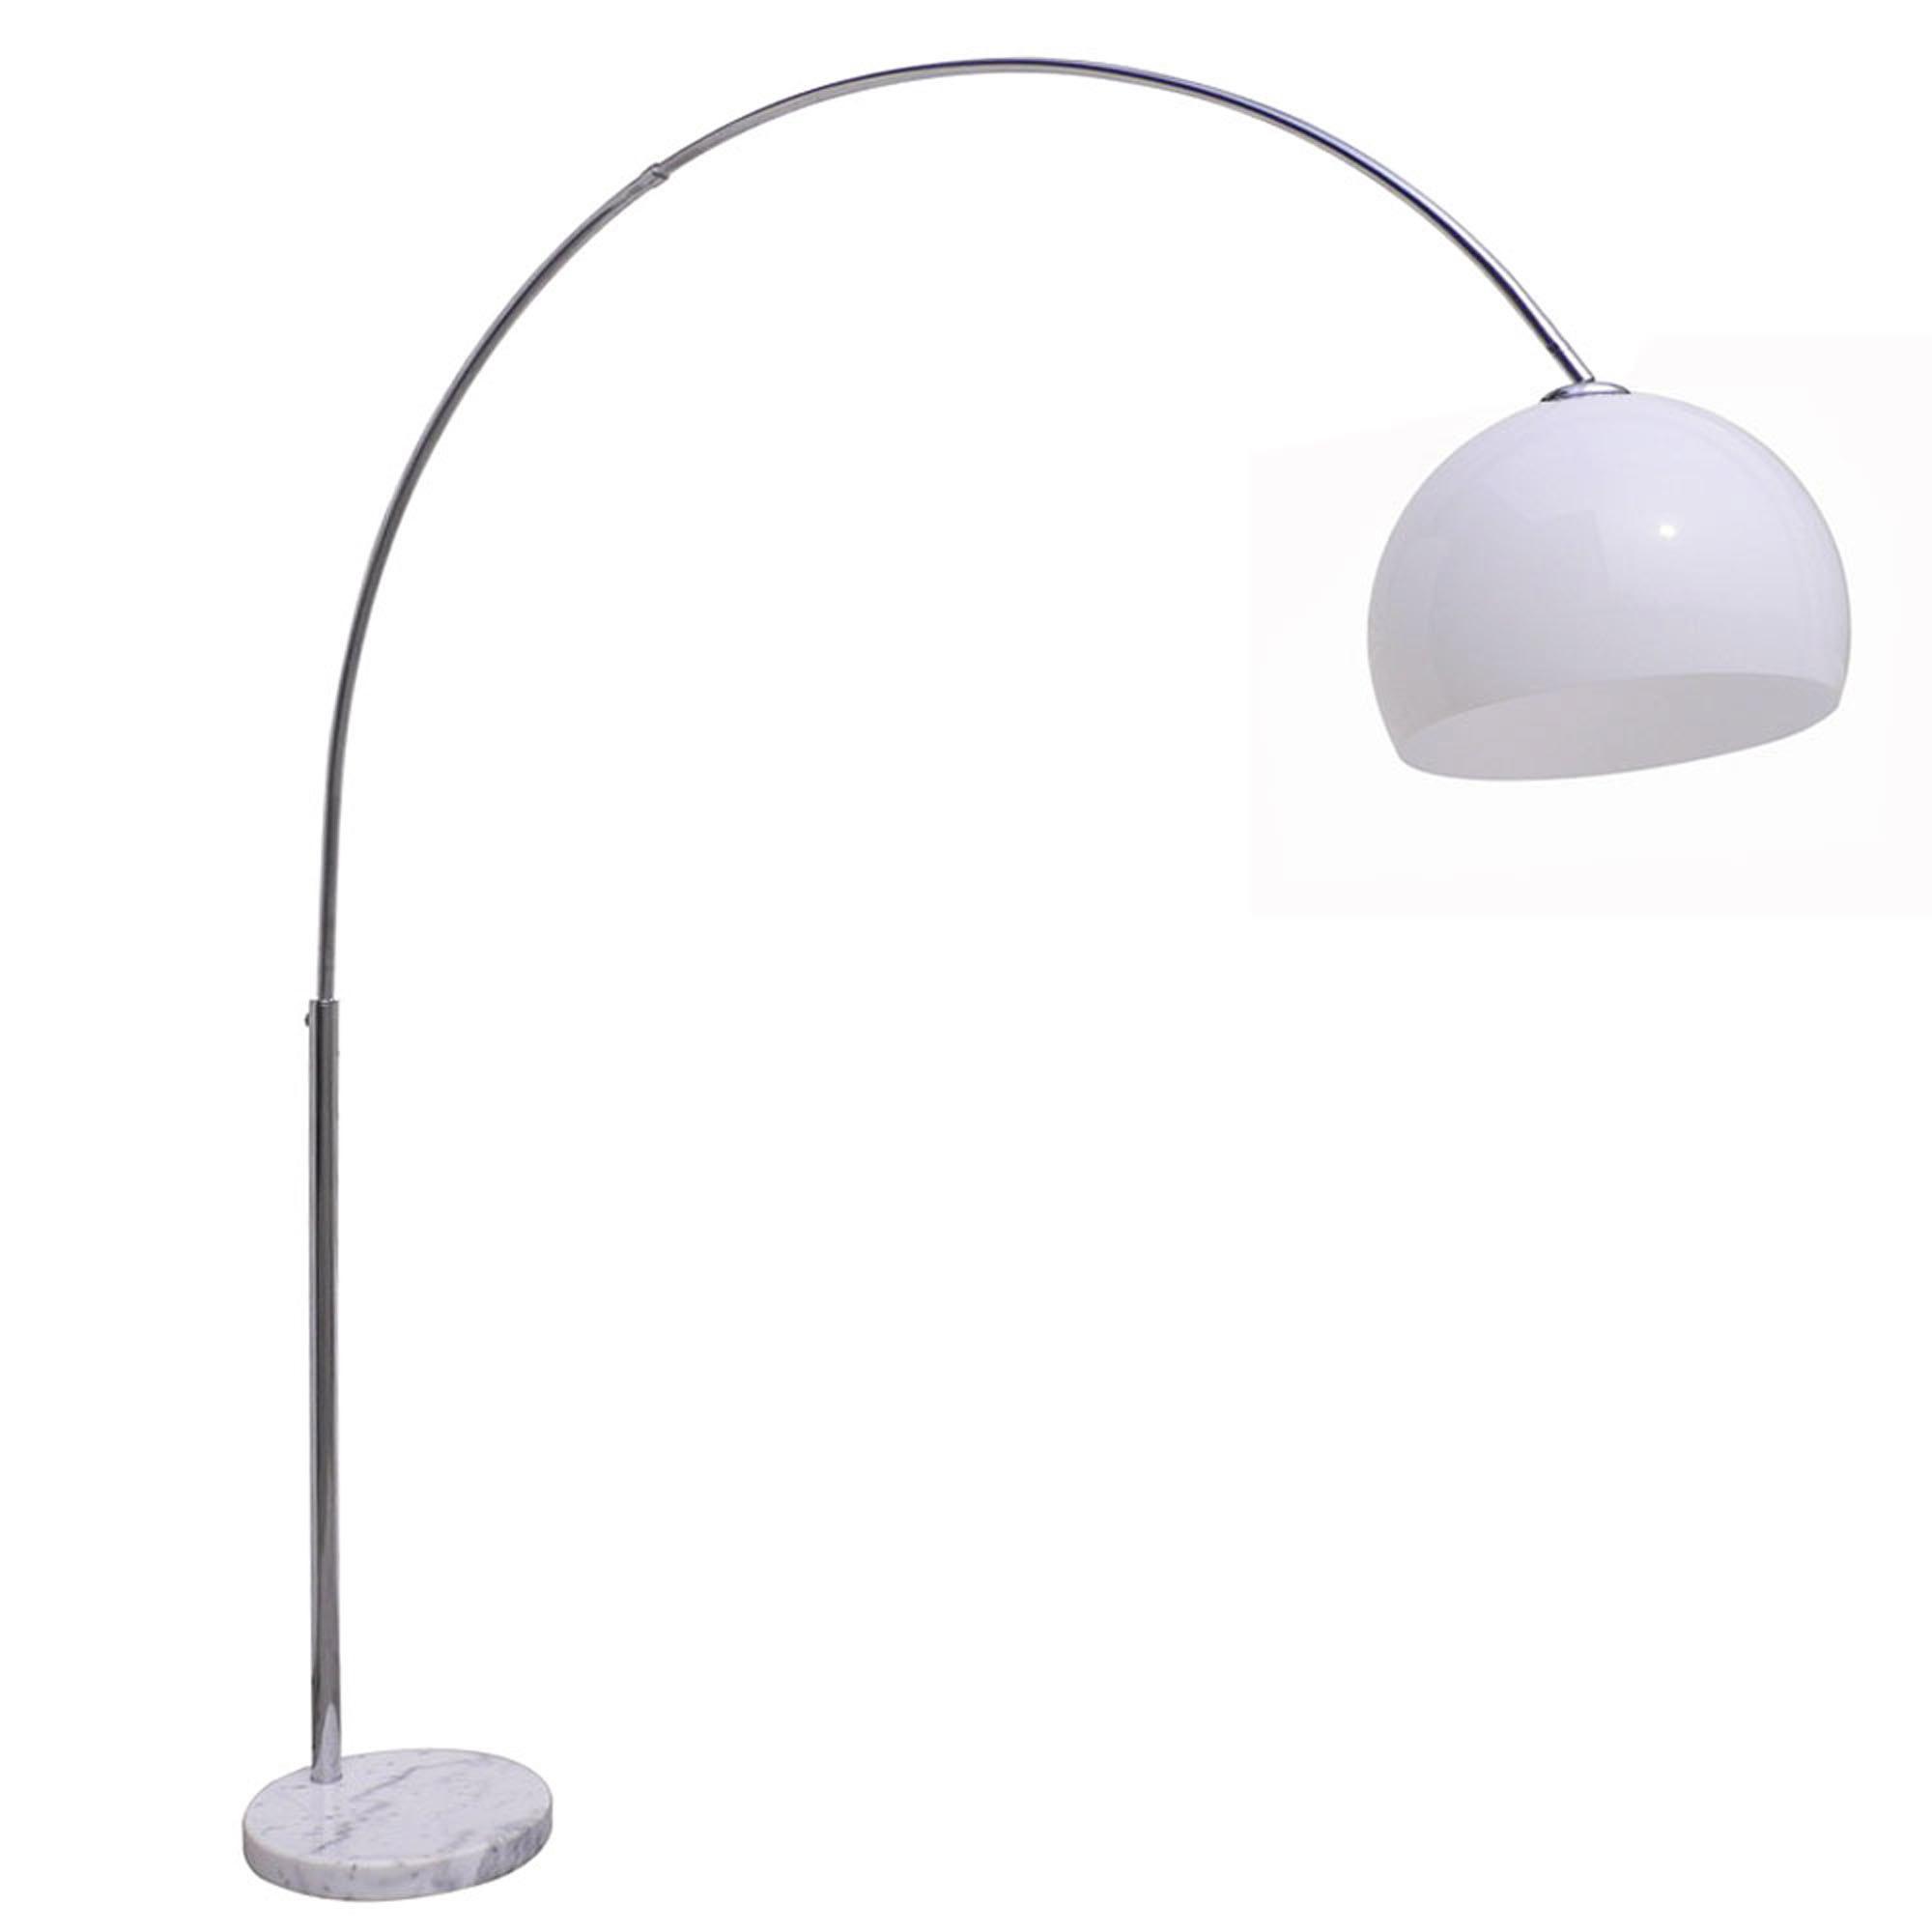 lampadaire castorama lampadaire ext rieur lola cm w lm couleurs avec lampadaire exterieur lola. Black Bedroom Furniture Sets. Home Design Ideas